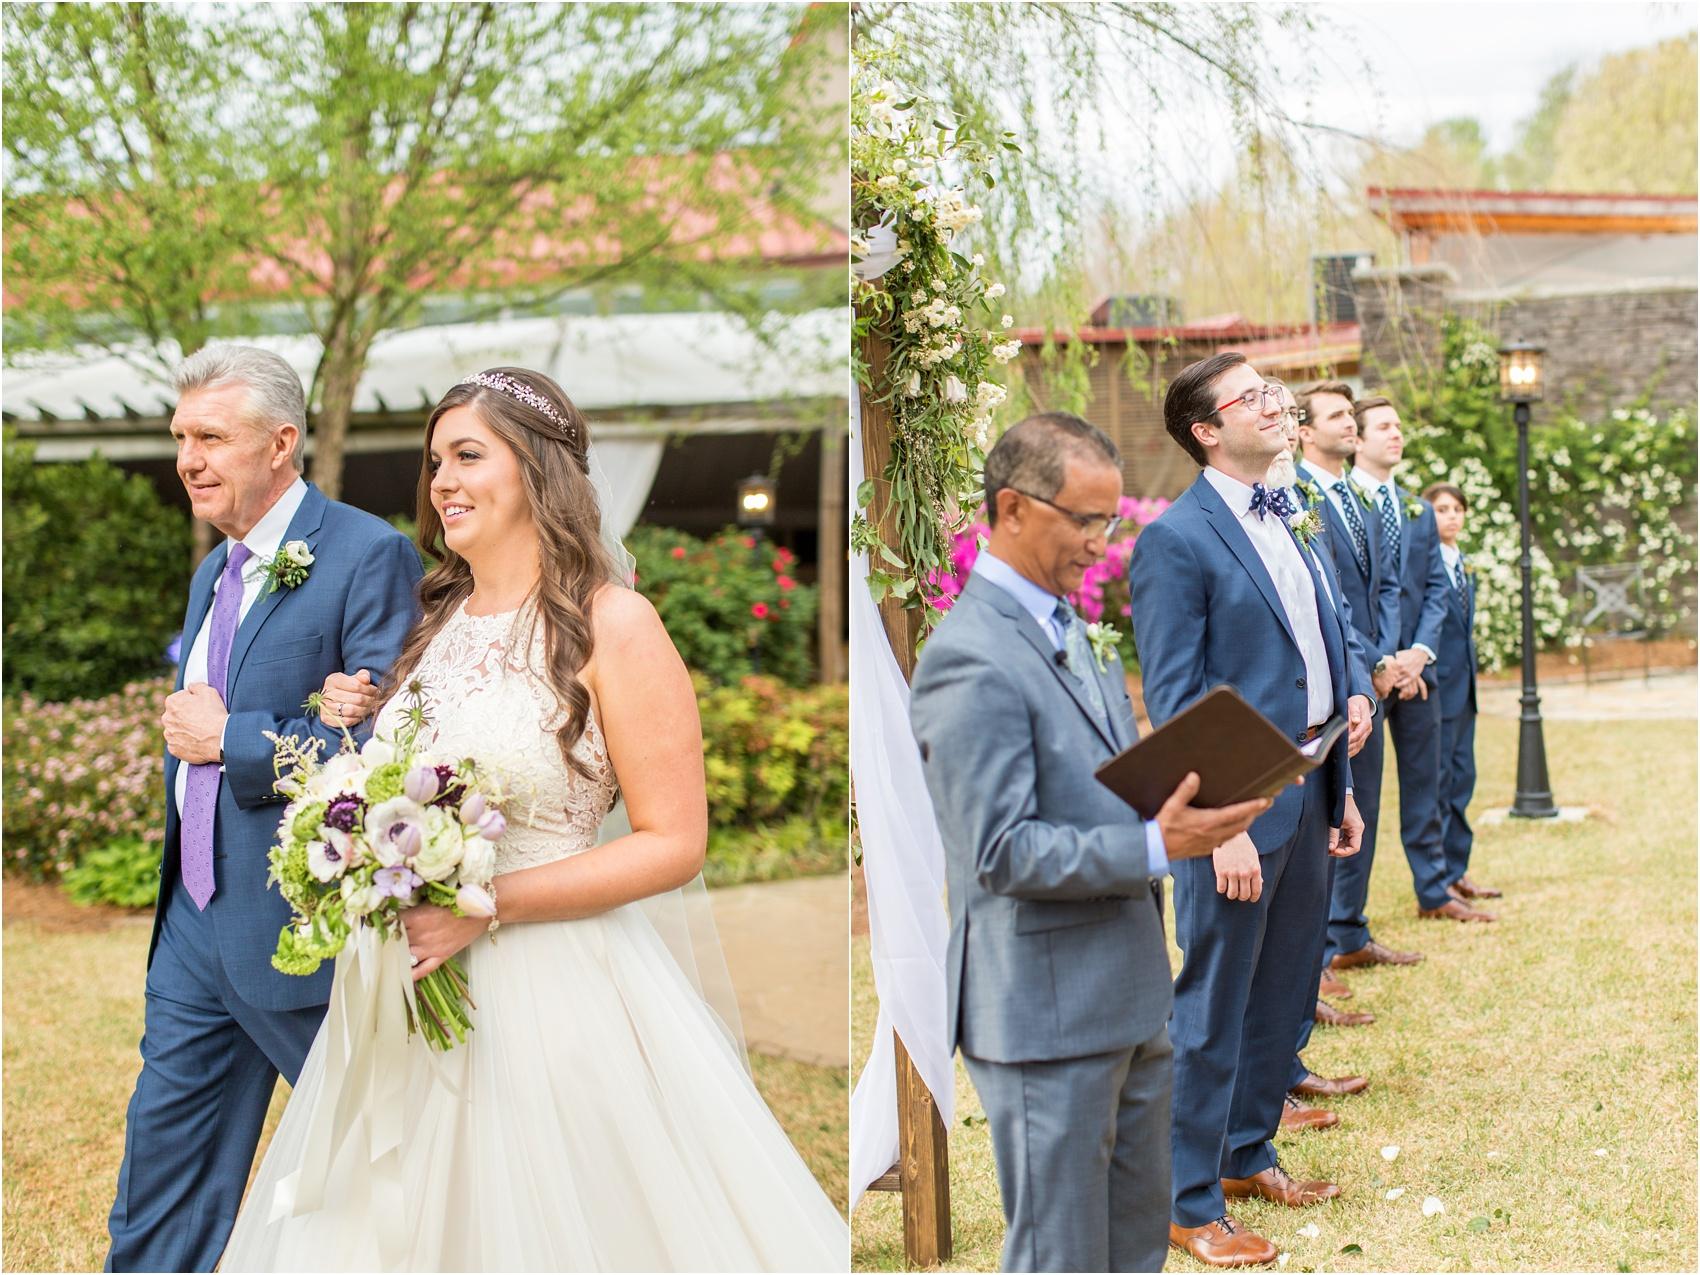 Savannah Eve Photography- Groseclose Wedding- Blog-54.jpg